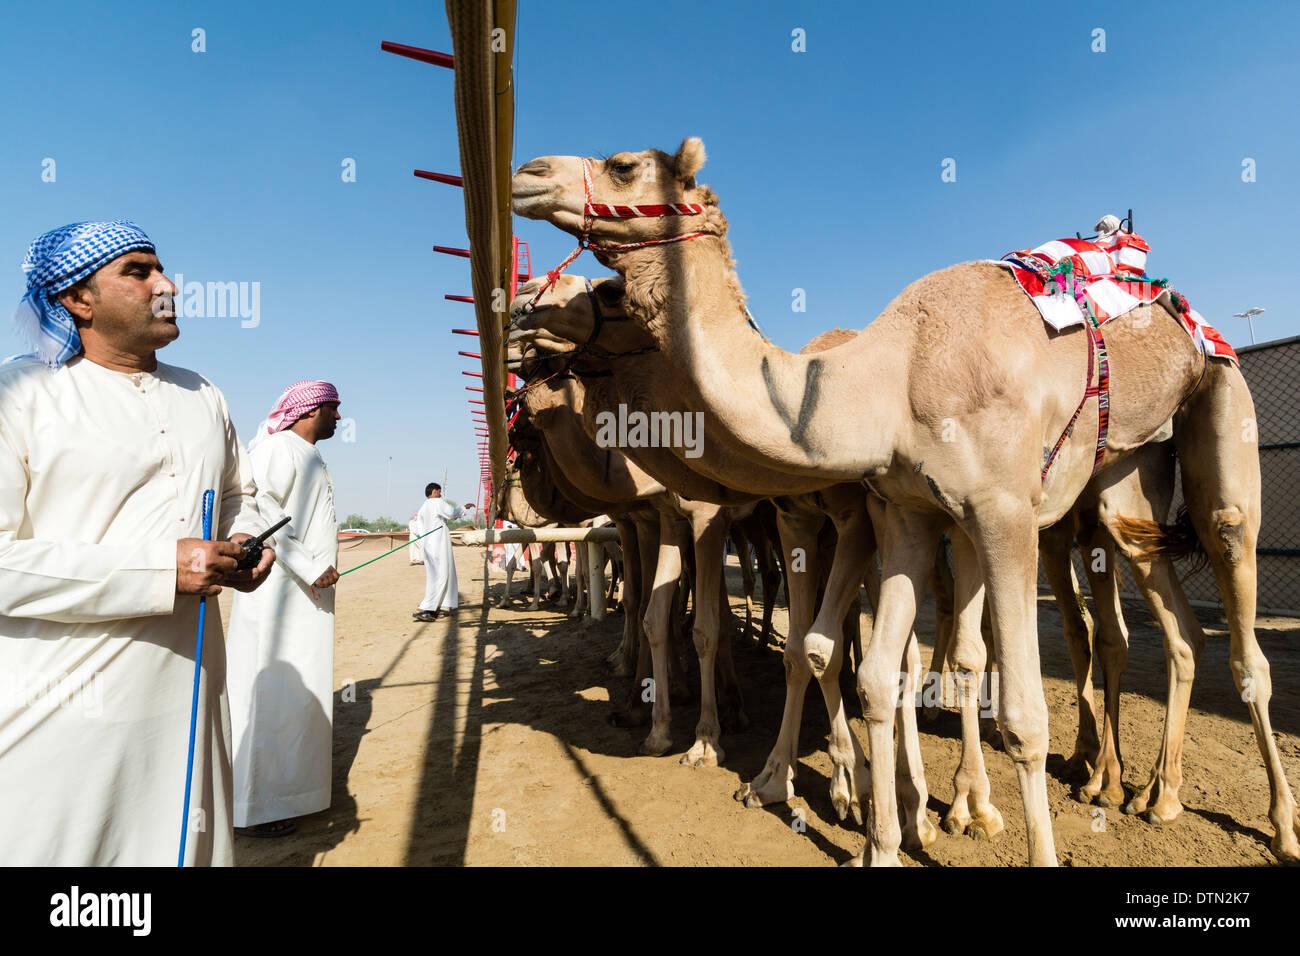 Camels at starting gate at Dubai Camel Racing Club at Al Marmoum in Dubai United Arab Emirates - Stock Image